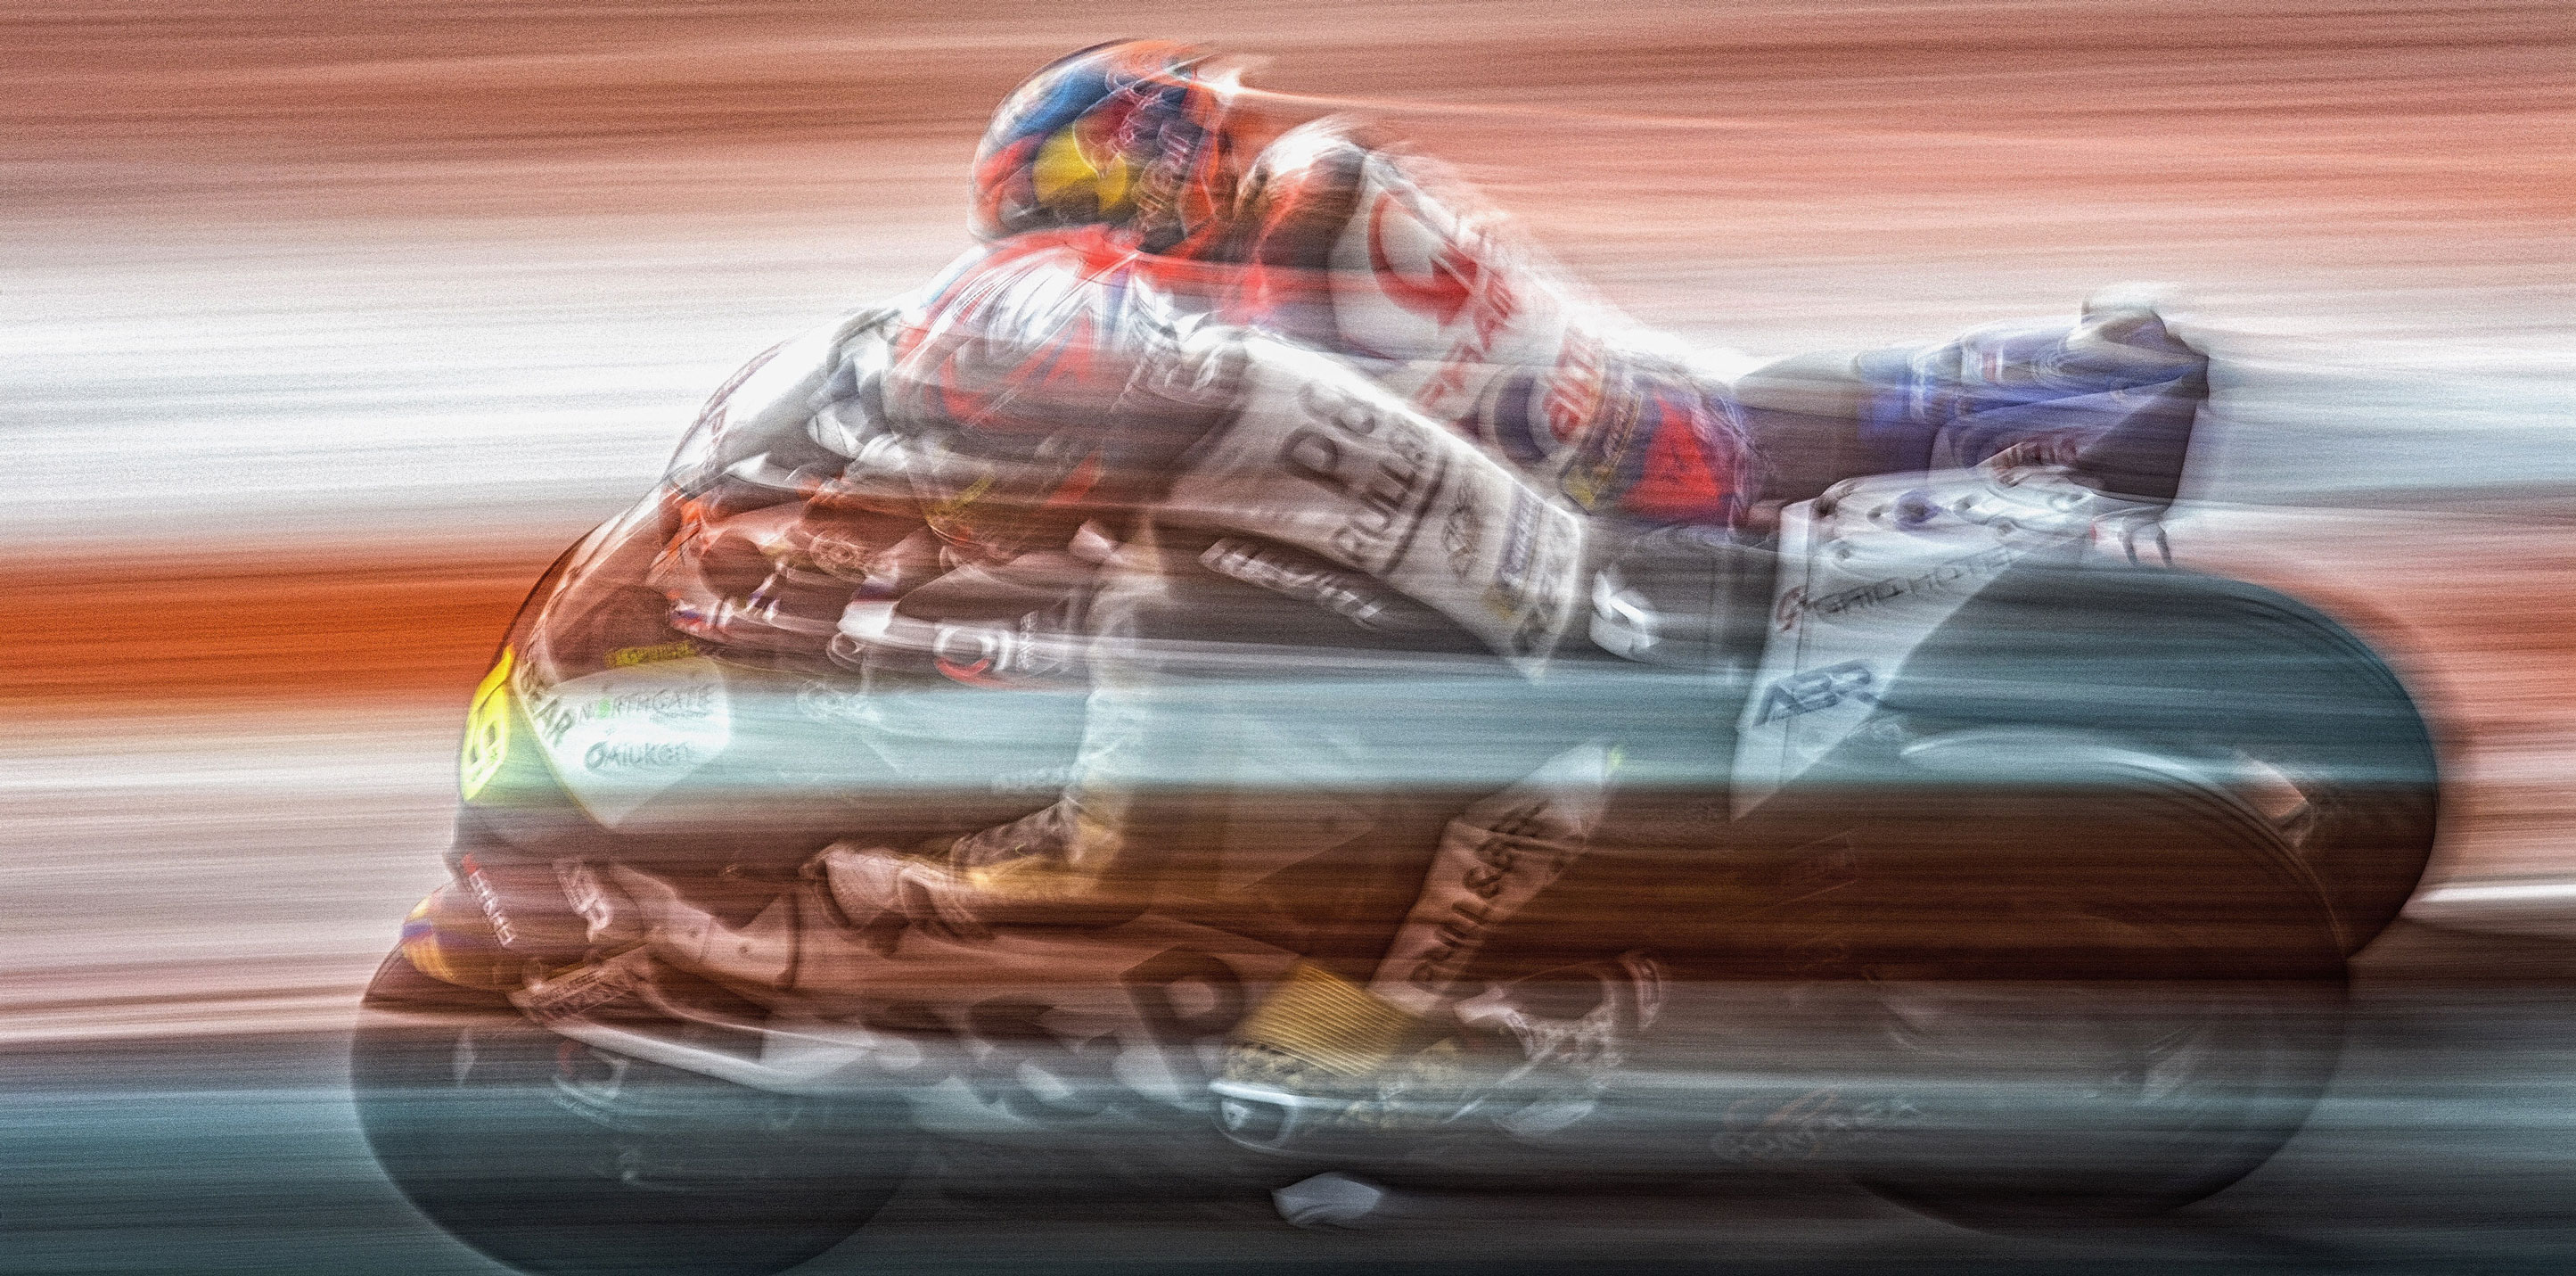 La Lista Completa degli Sponsor MotoGP per la Stagione 2019